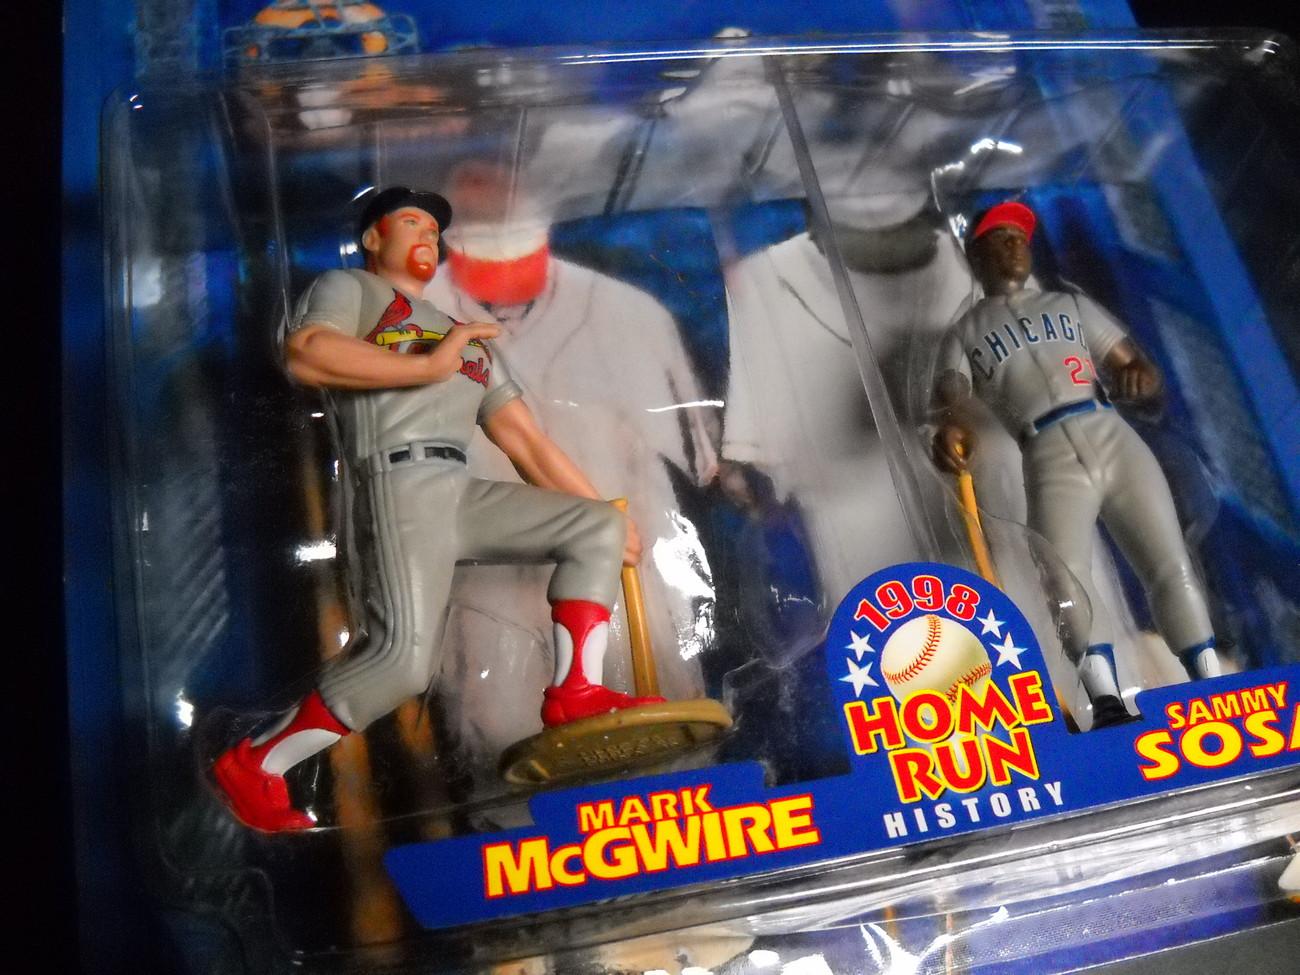 Starting Line Up 1998 Home Run History Series McGwire Sosa Baseball Sealed Card